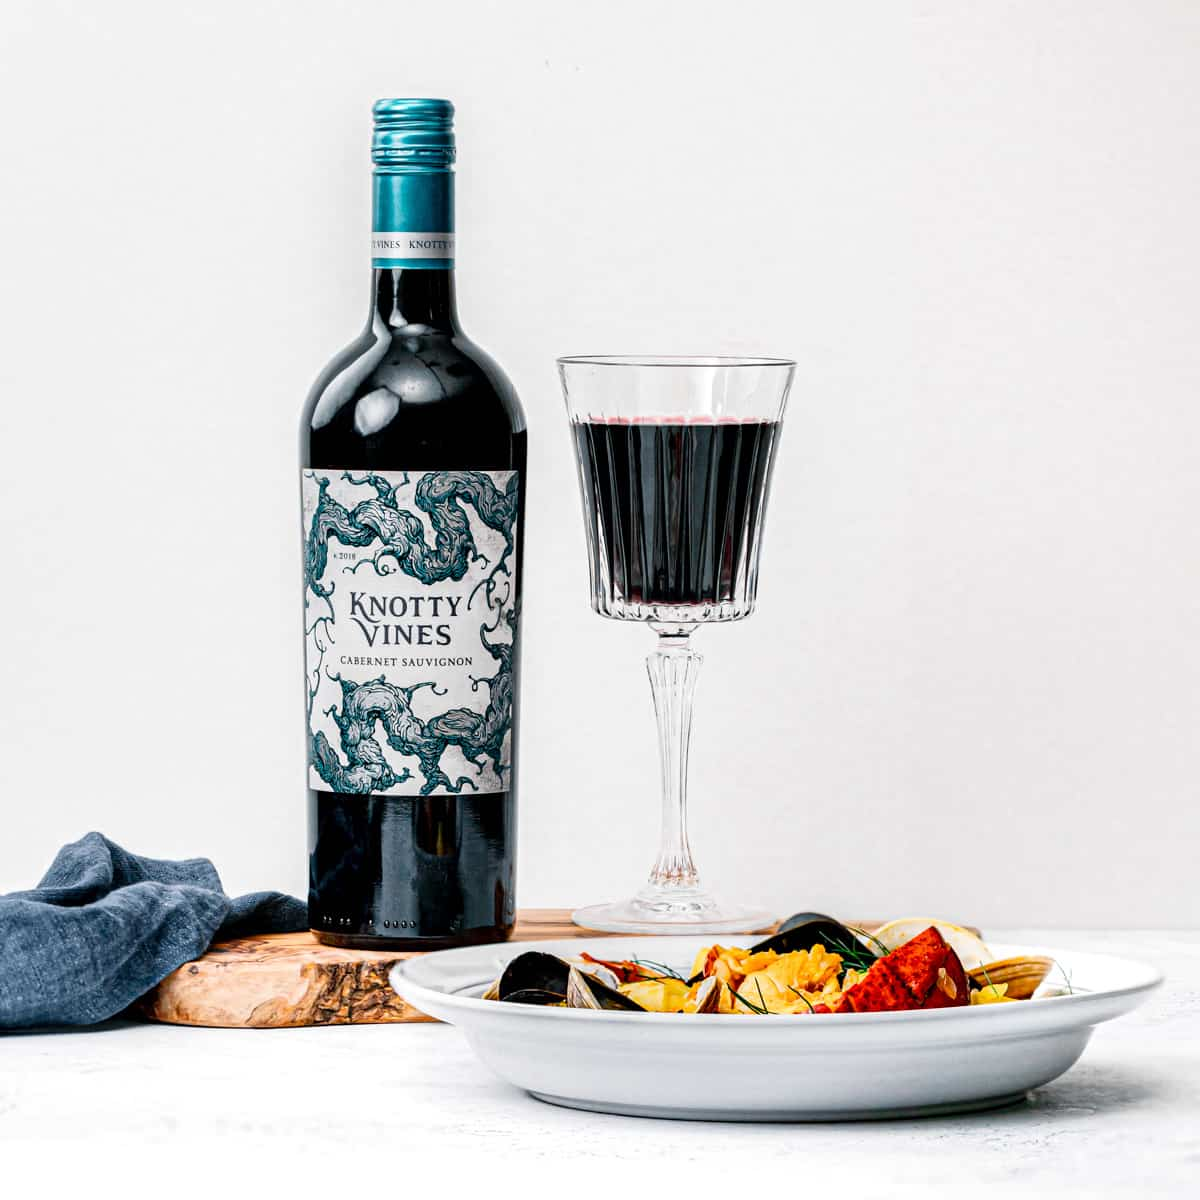 Knotty Vines Cabernet Savignon with Boullabaisse.